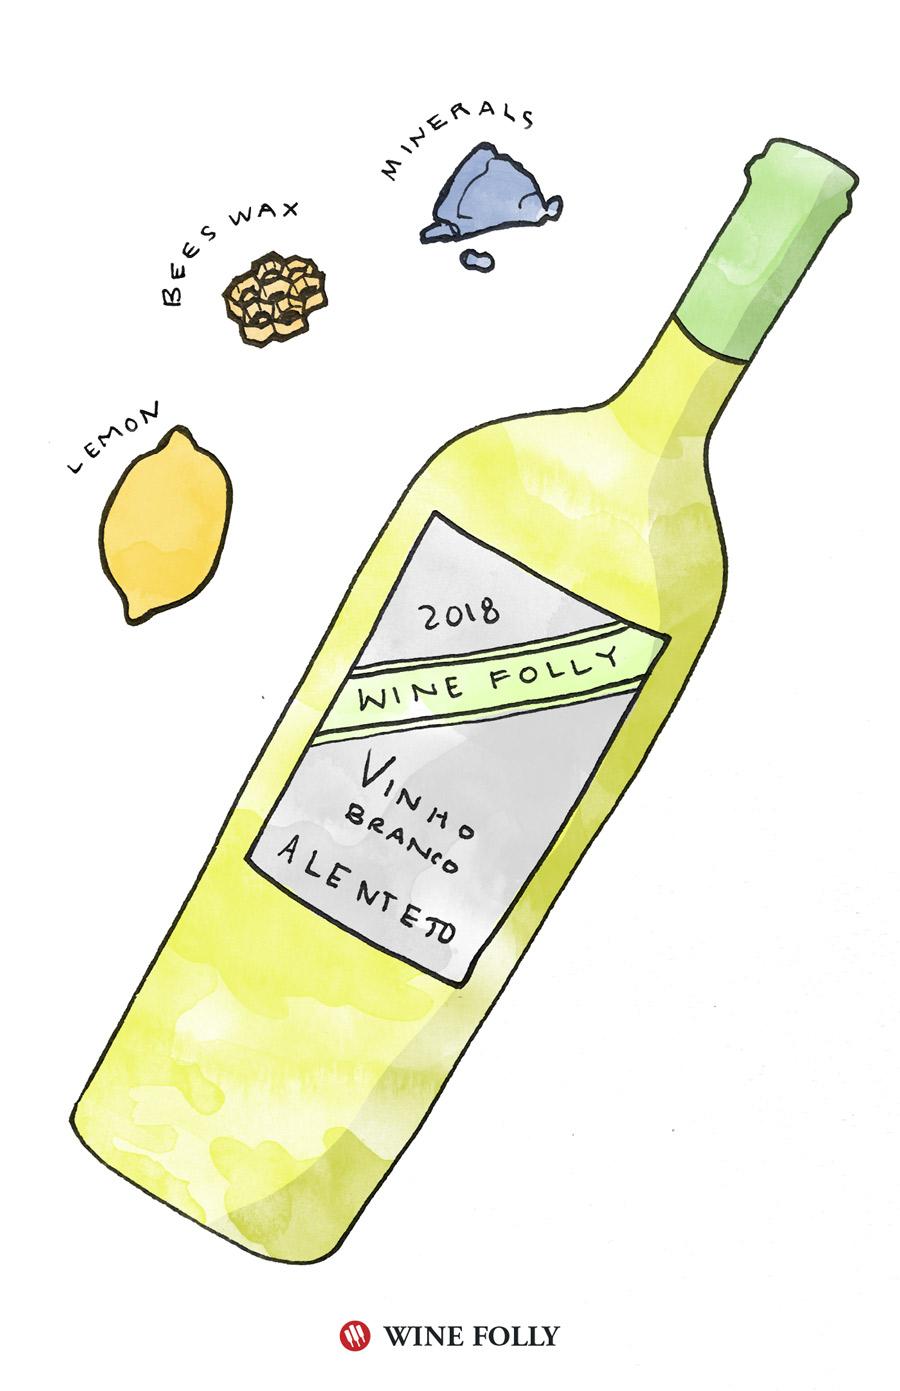 Vinho Branco Portuguese White Wine Tasting Notes Illustration by Wine Folly